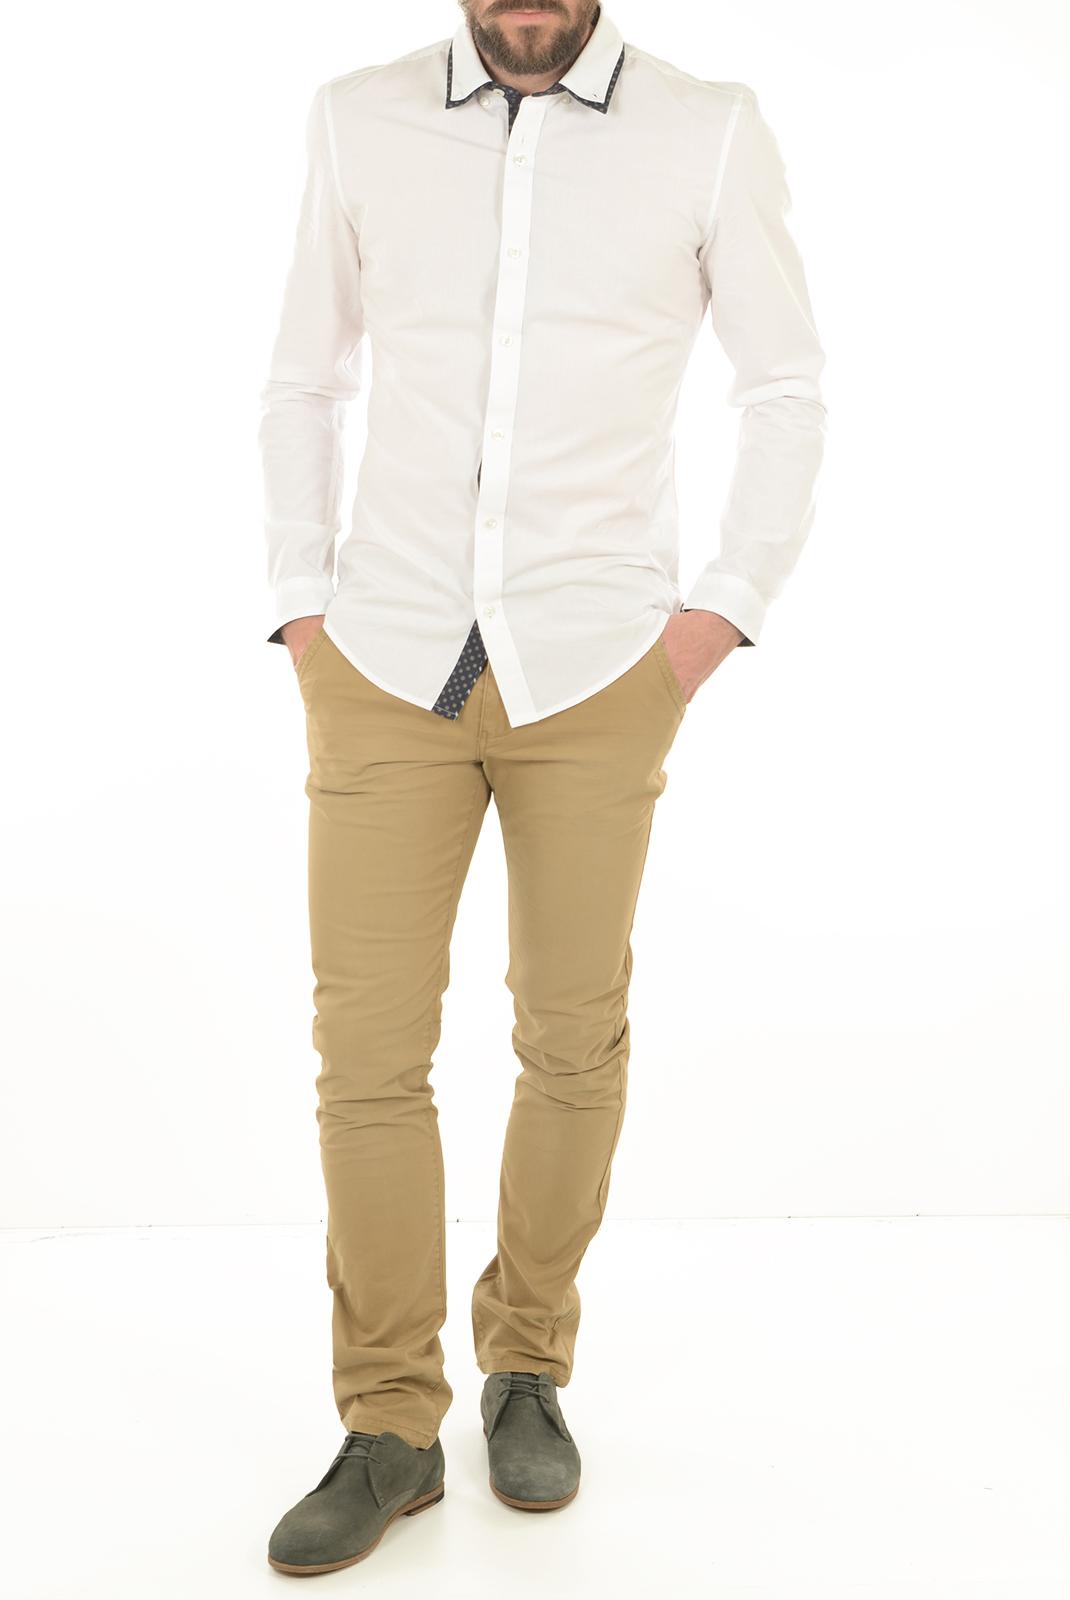 Pantalons chino/citadin  Lee cooper NATHAN 5133 LIGHT CAMEL